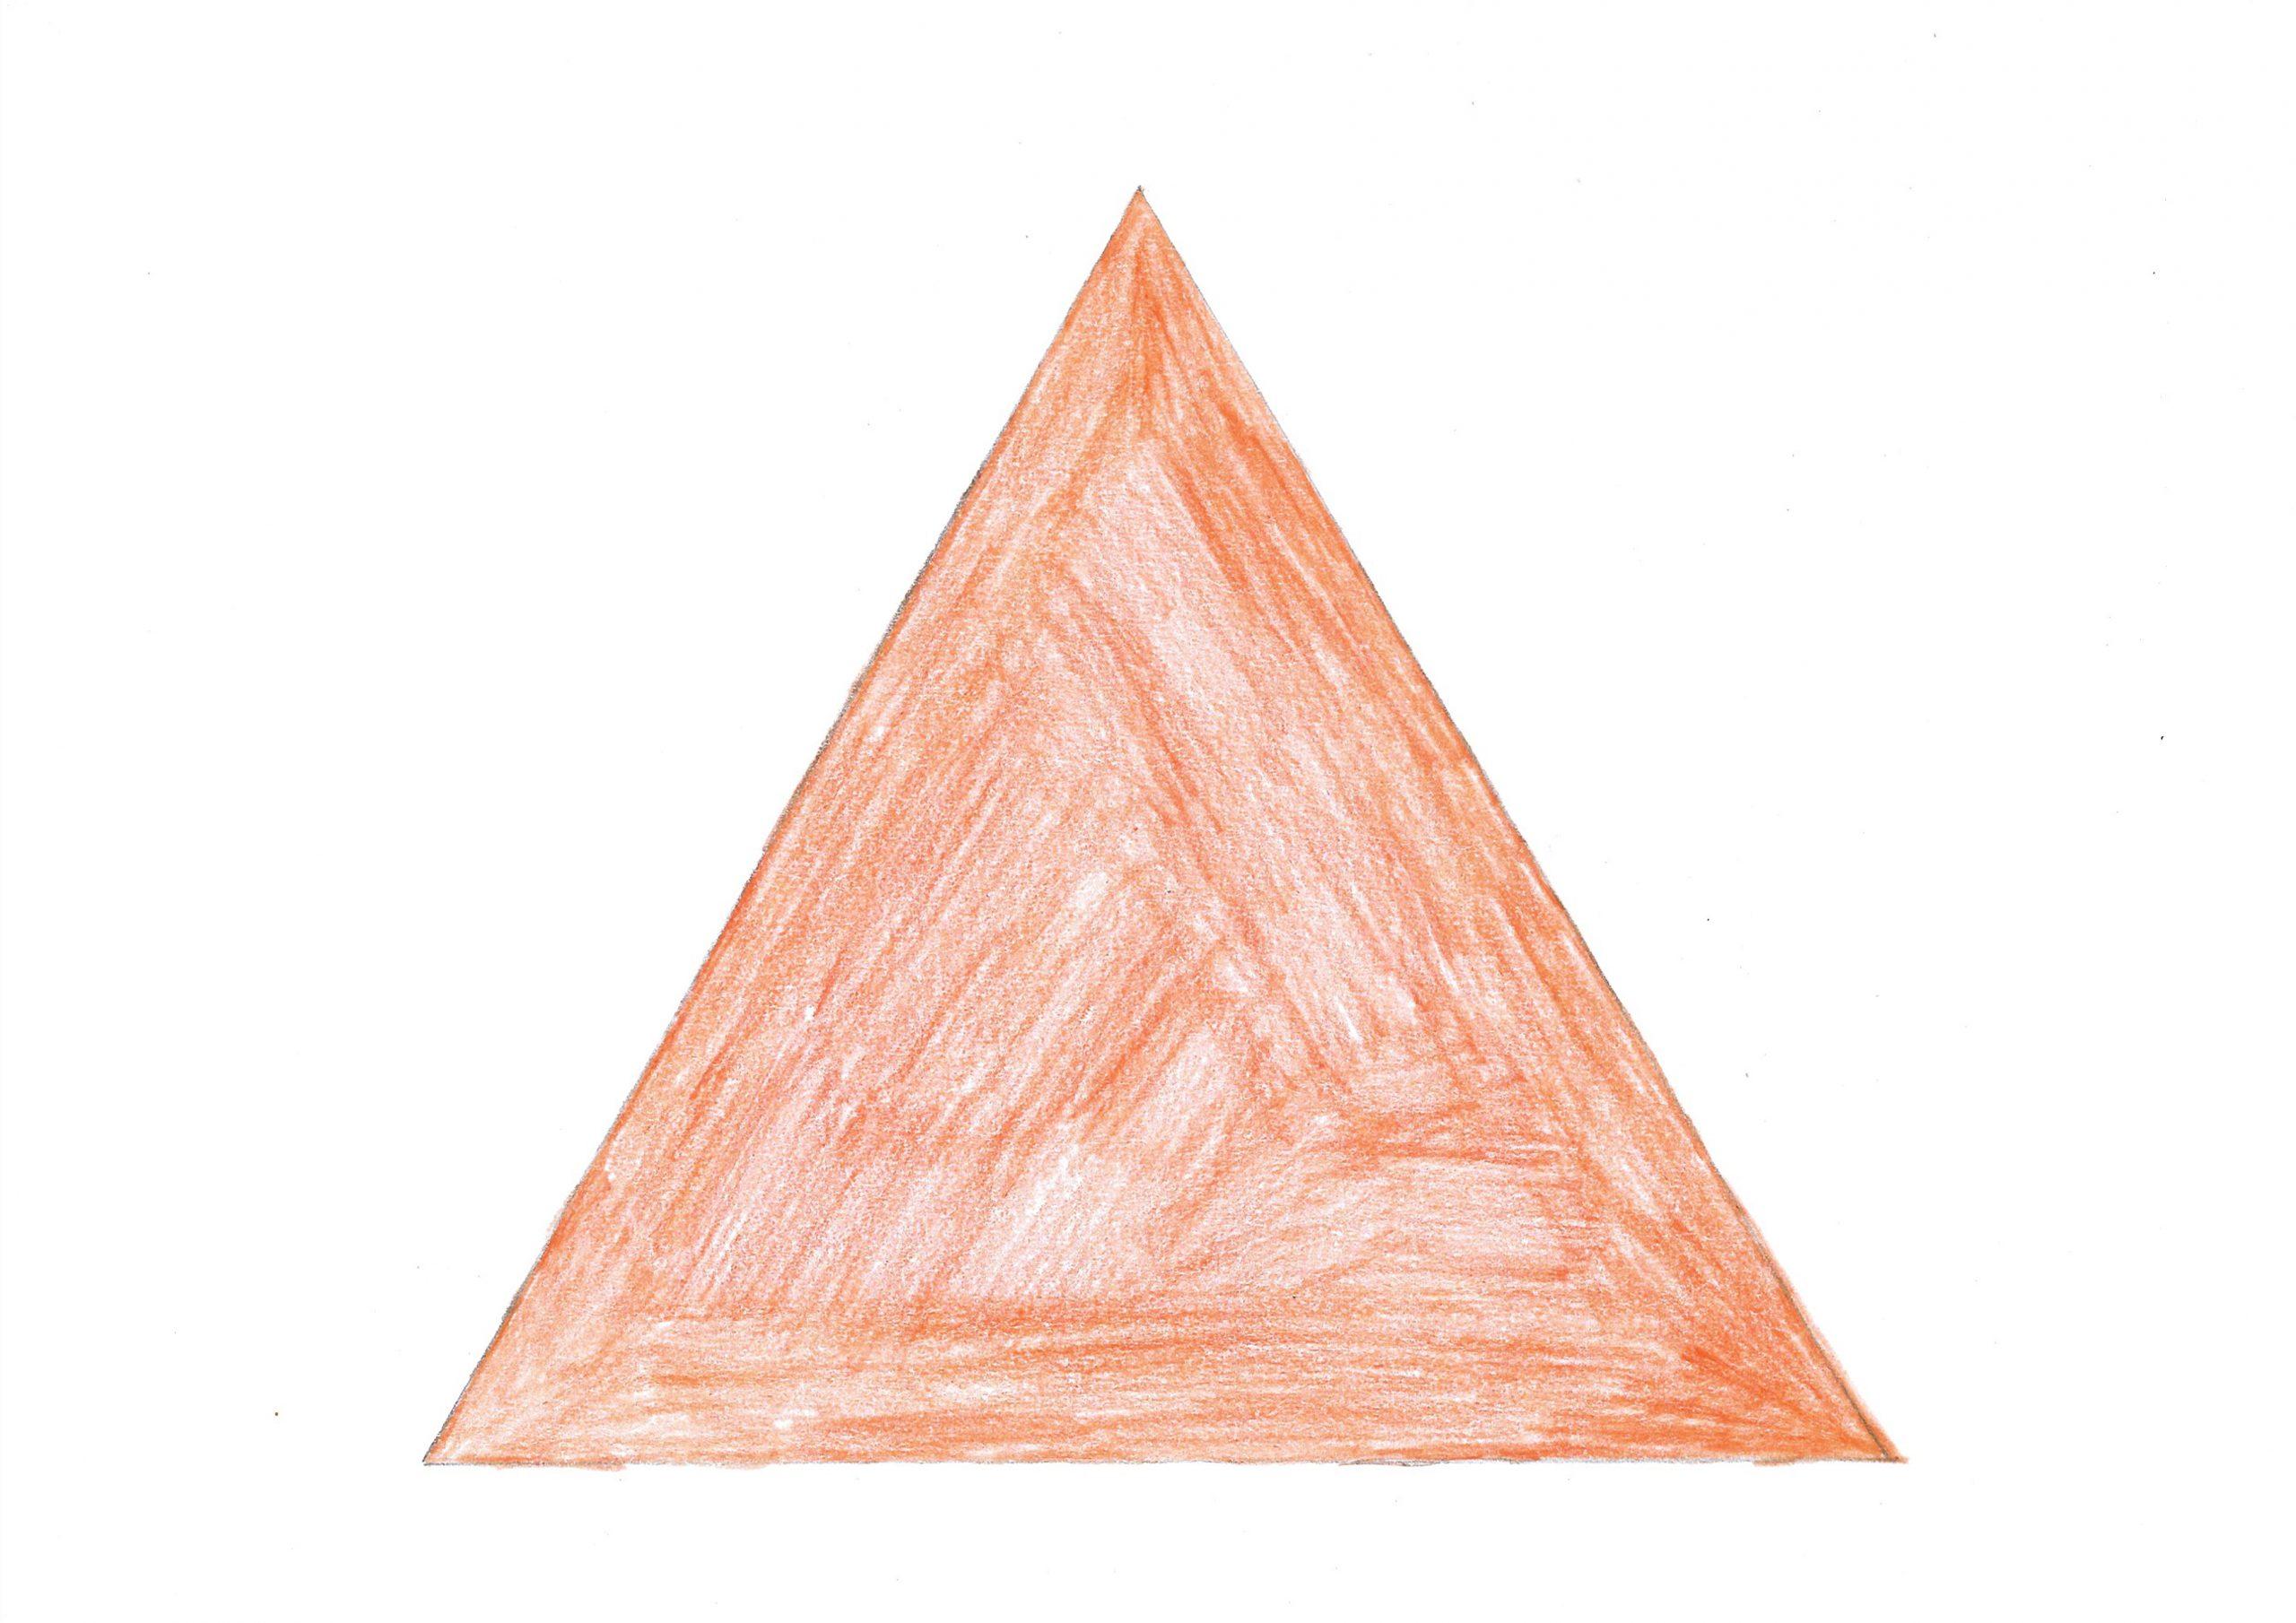 Takambyapy — The triangle